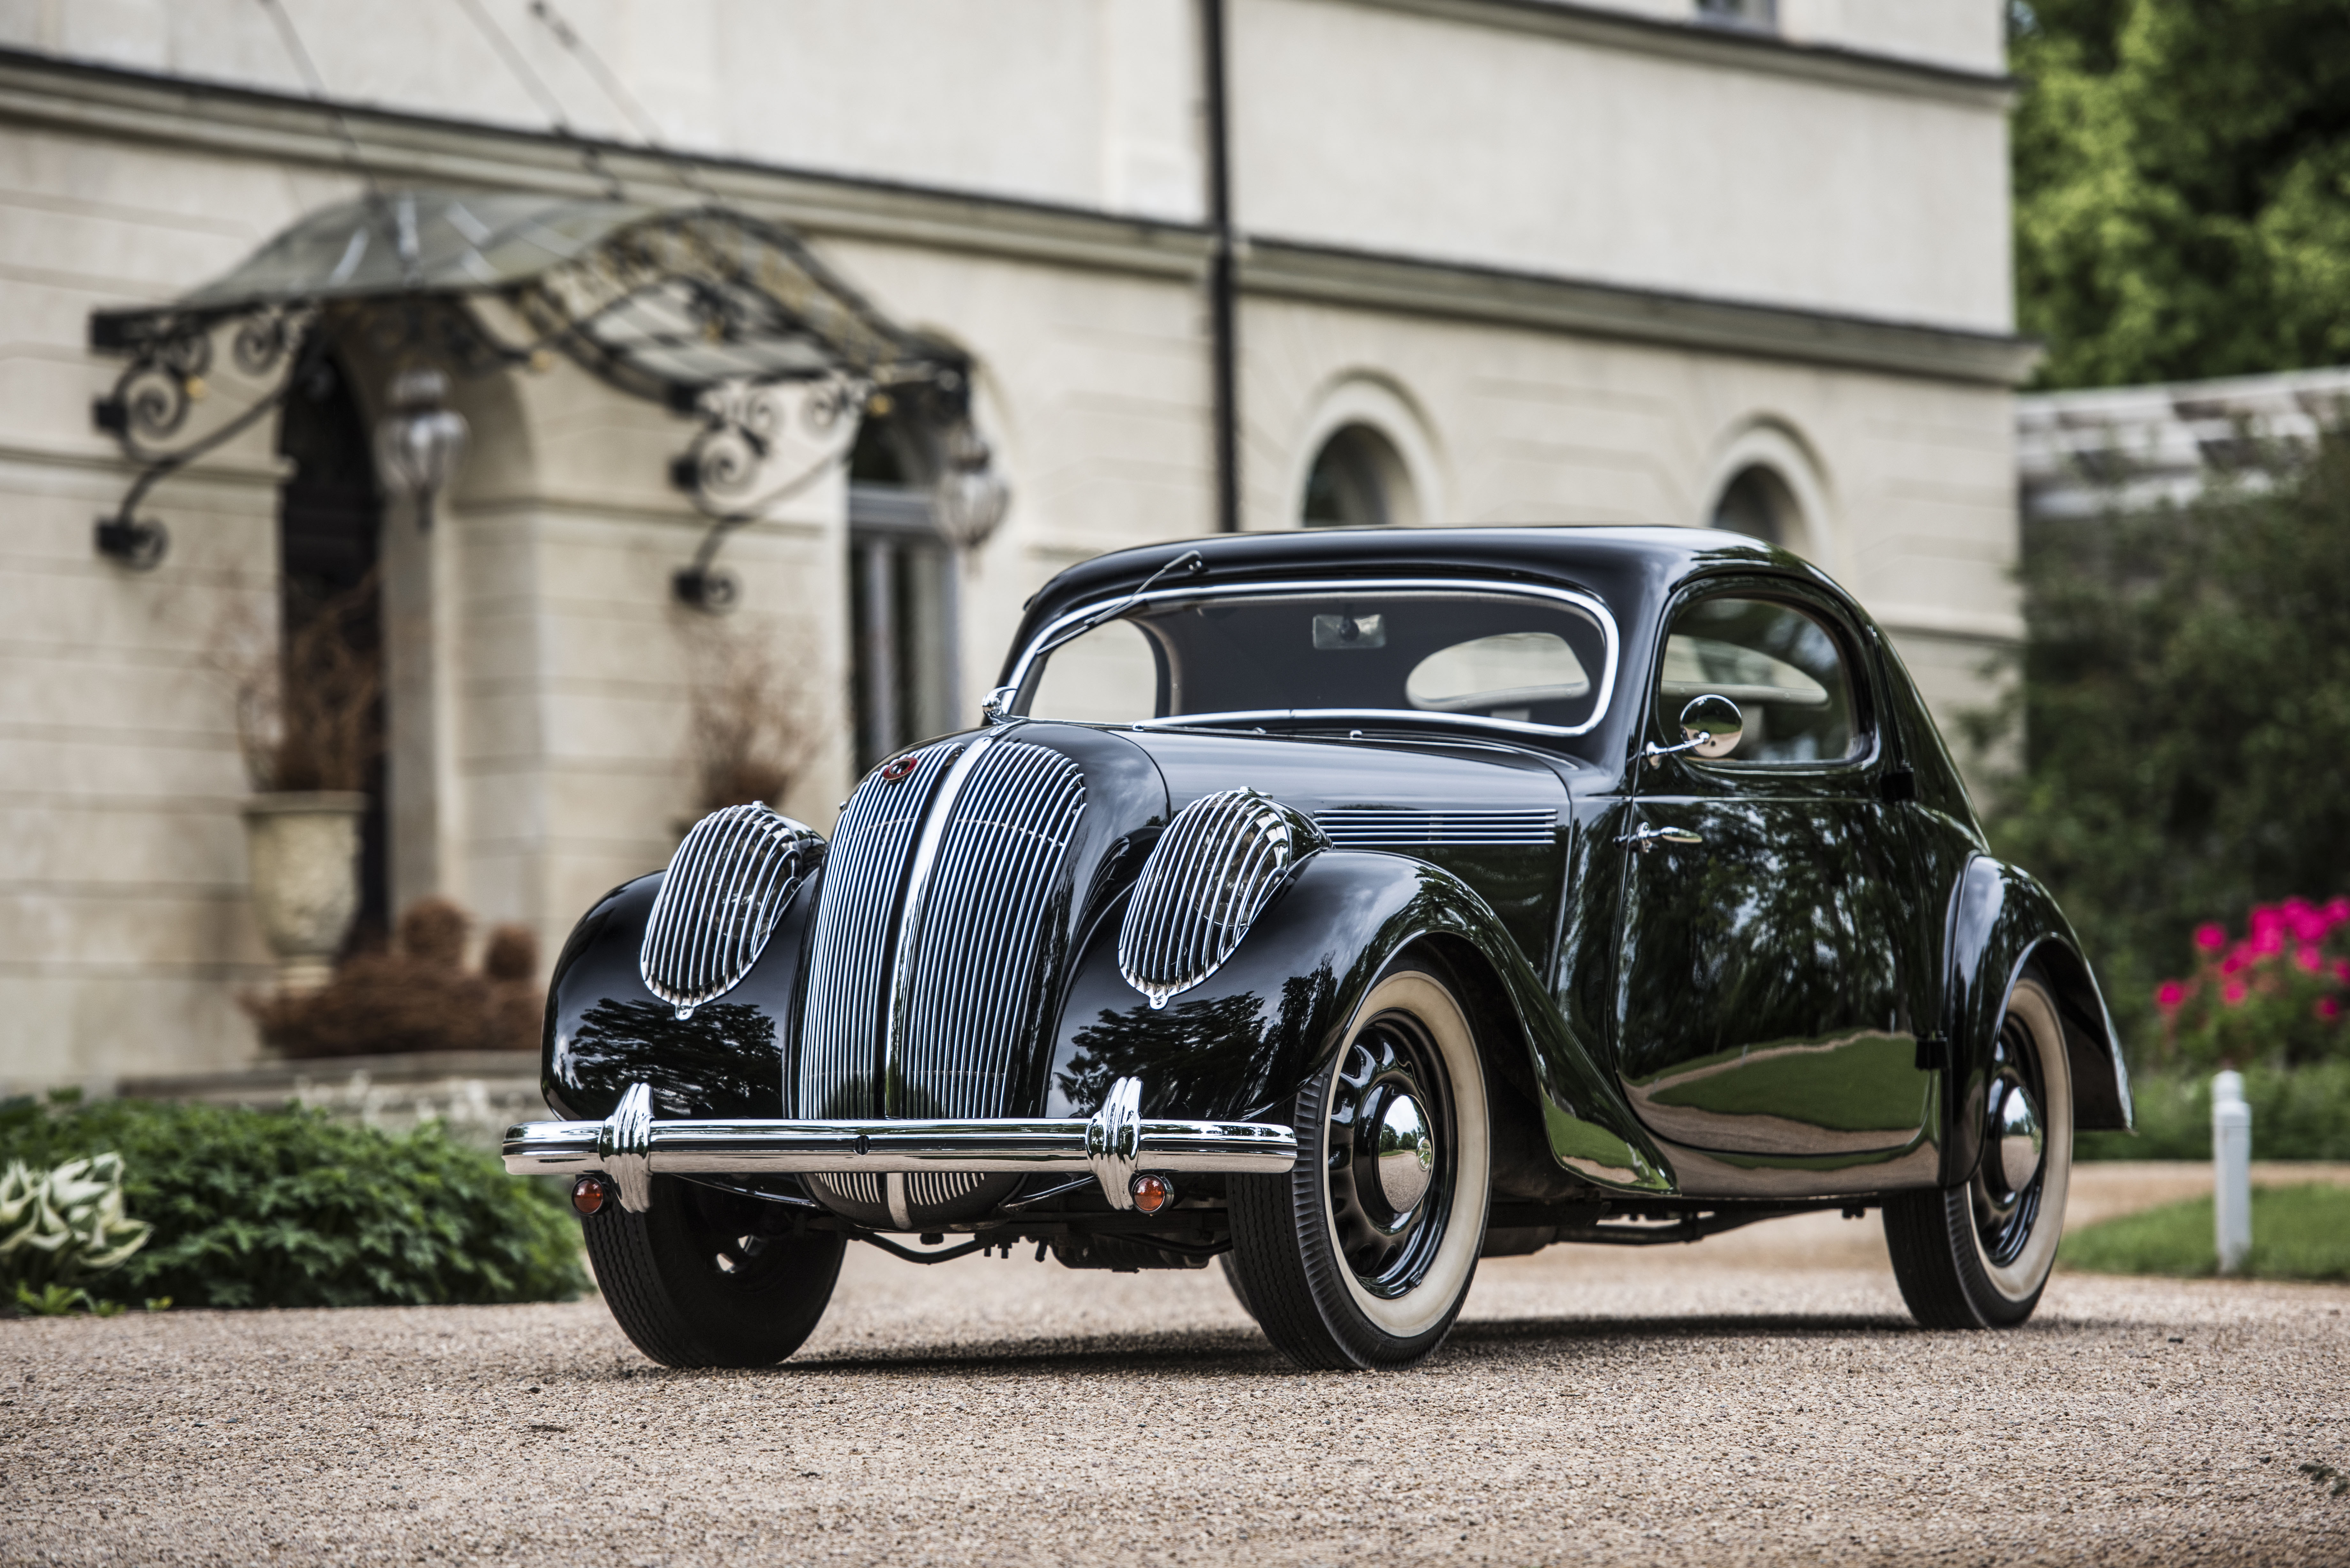 SKODA POPULAR Monte Carlo (1936–1939): The elegant model with rally DNA - Image 8